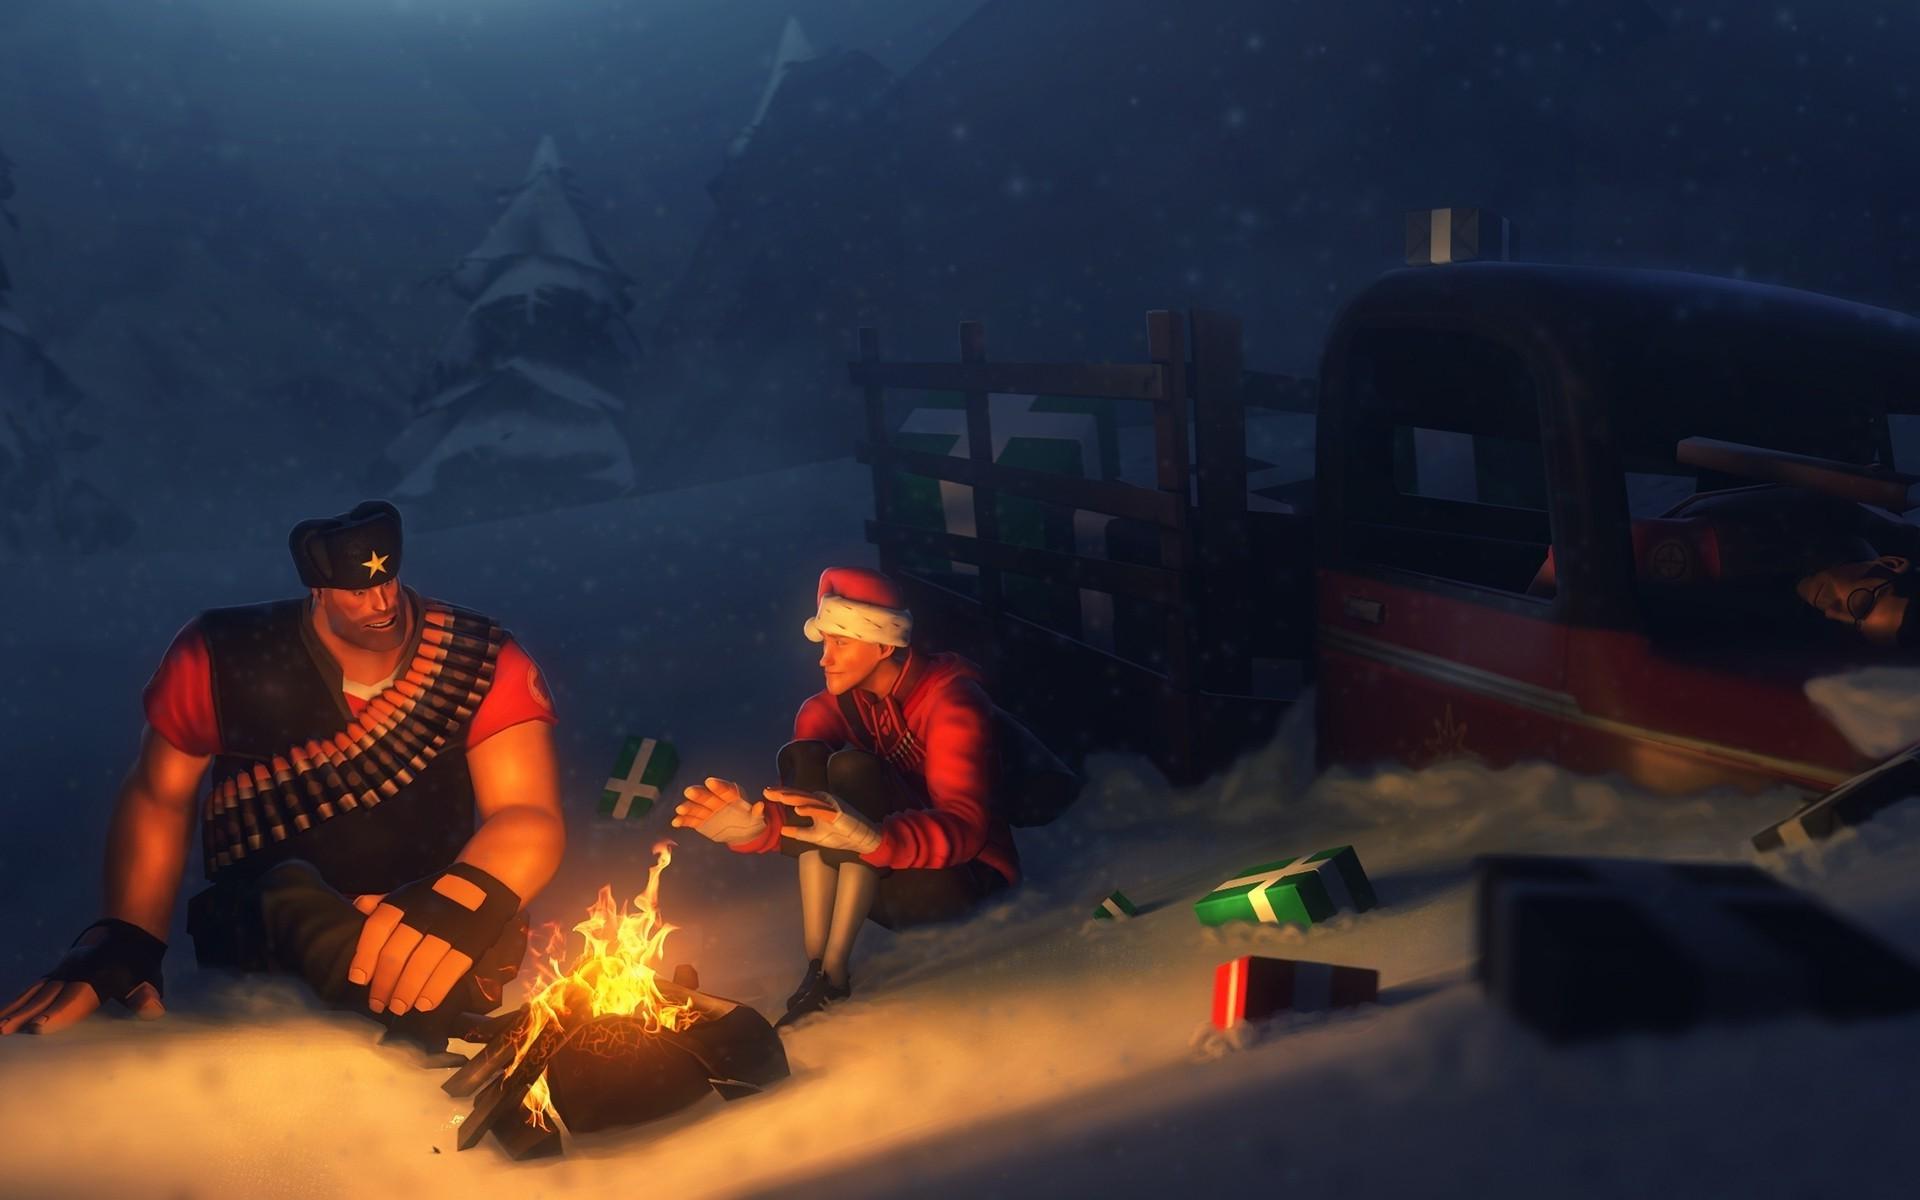 Wallpaper : digital art, video games, snow, fire, presents, Team ...